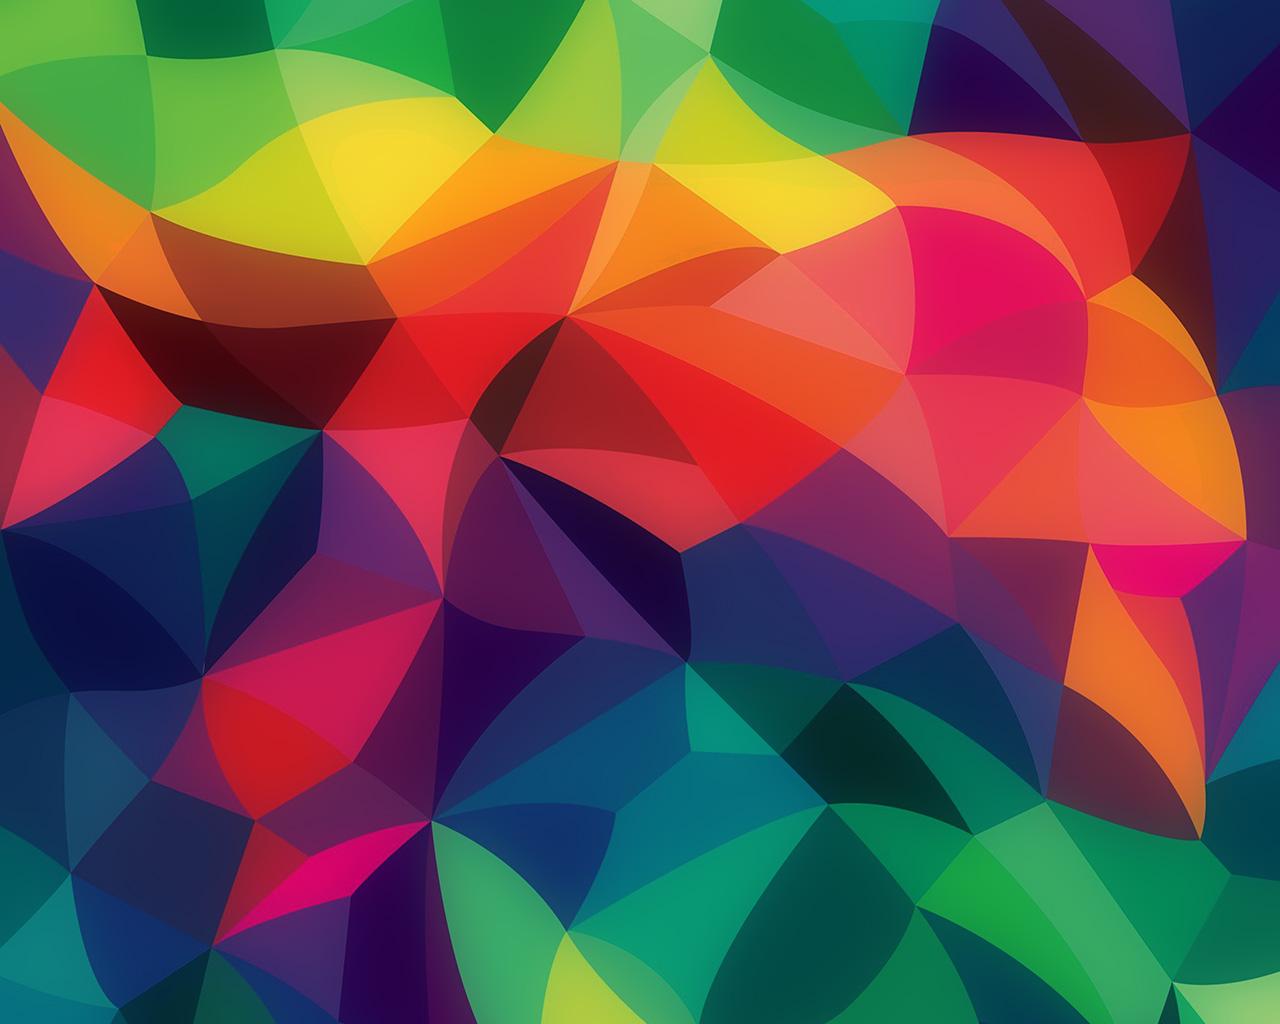 Iphone Se Fall Colors Wallpaper Vk42 Rainbow Abstract Colors Pastel Dark Pattern Wallpaper